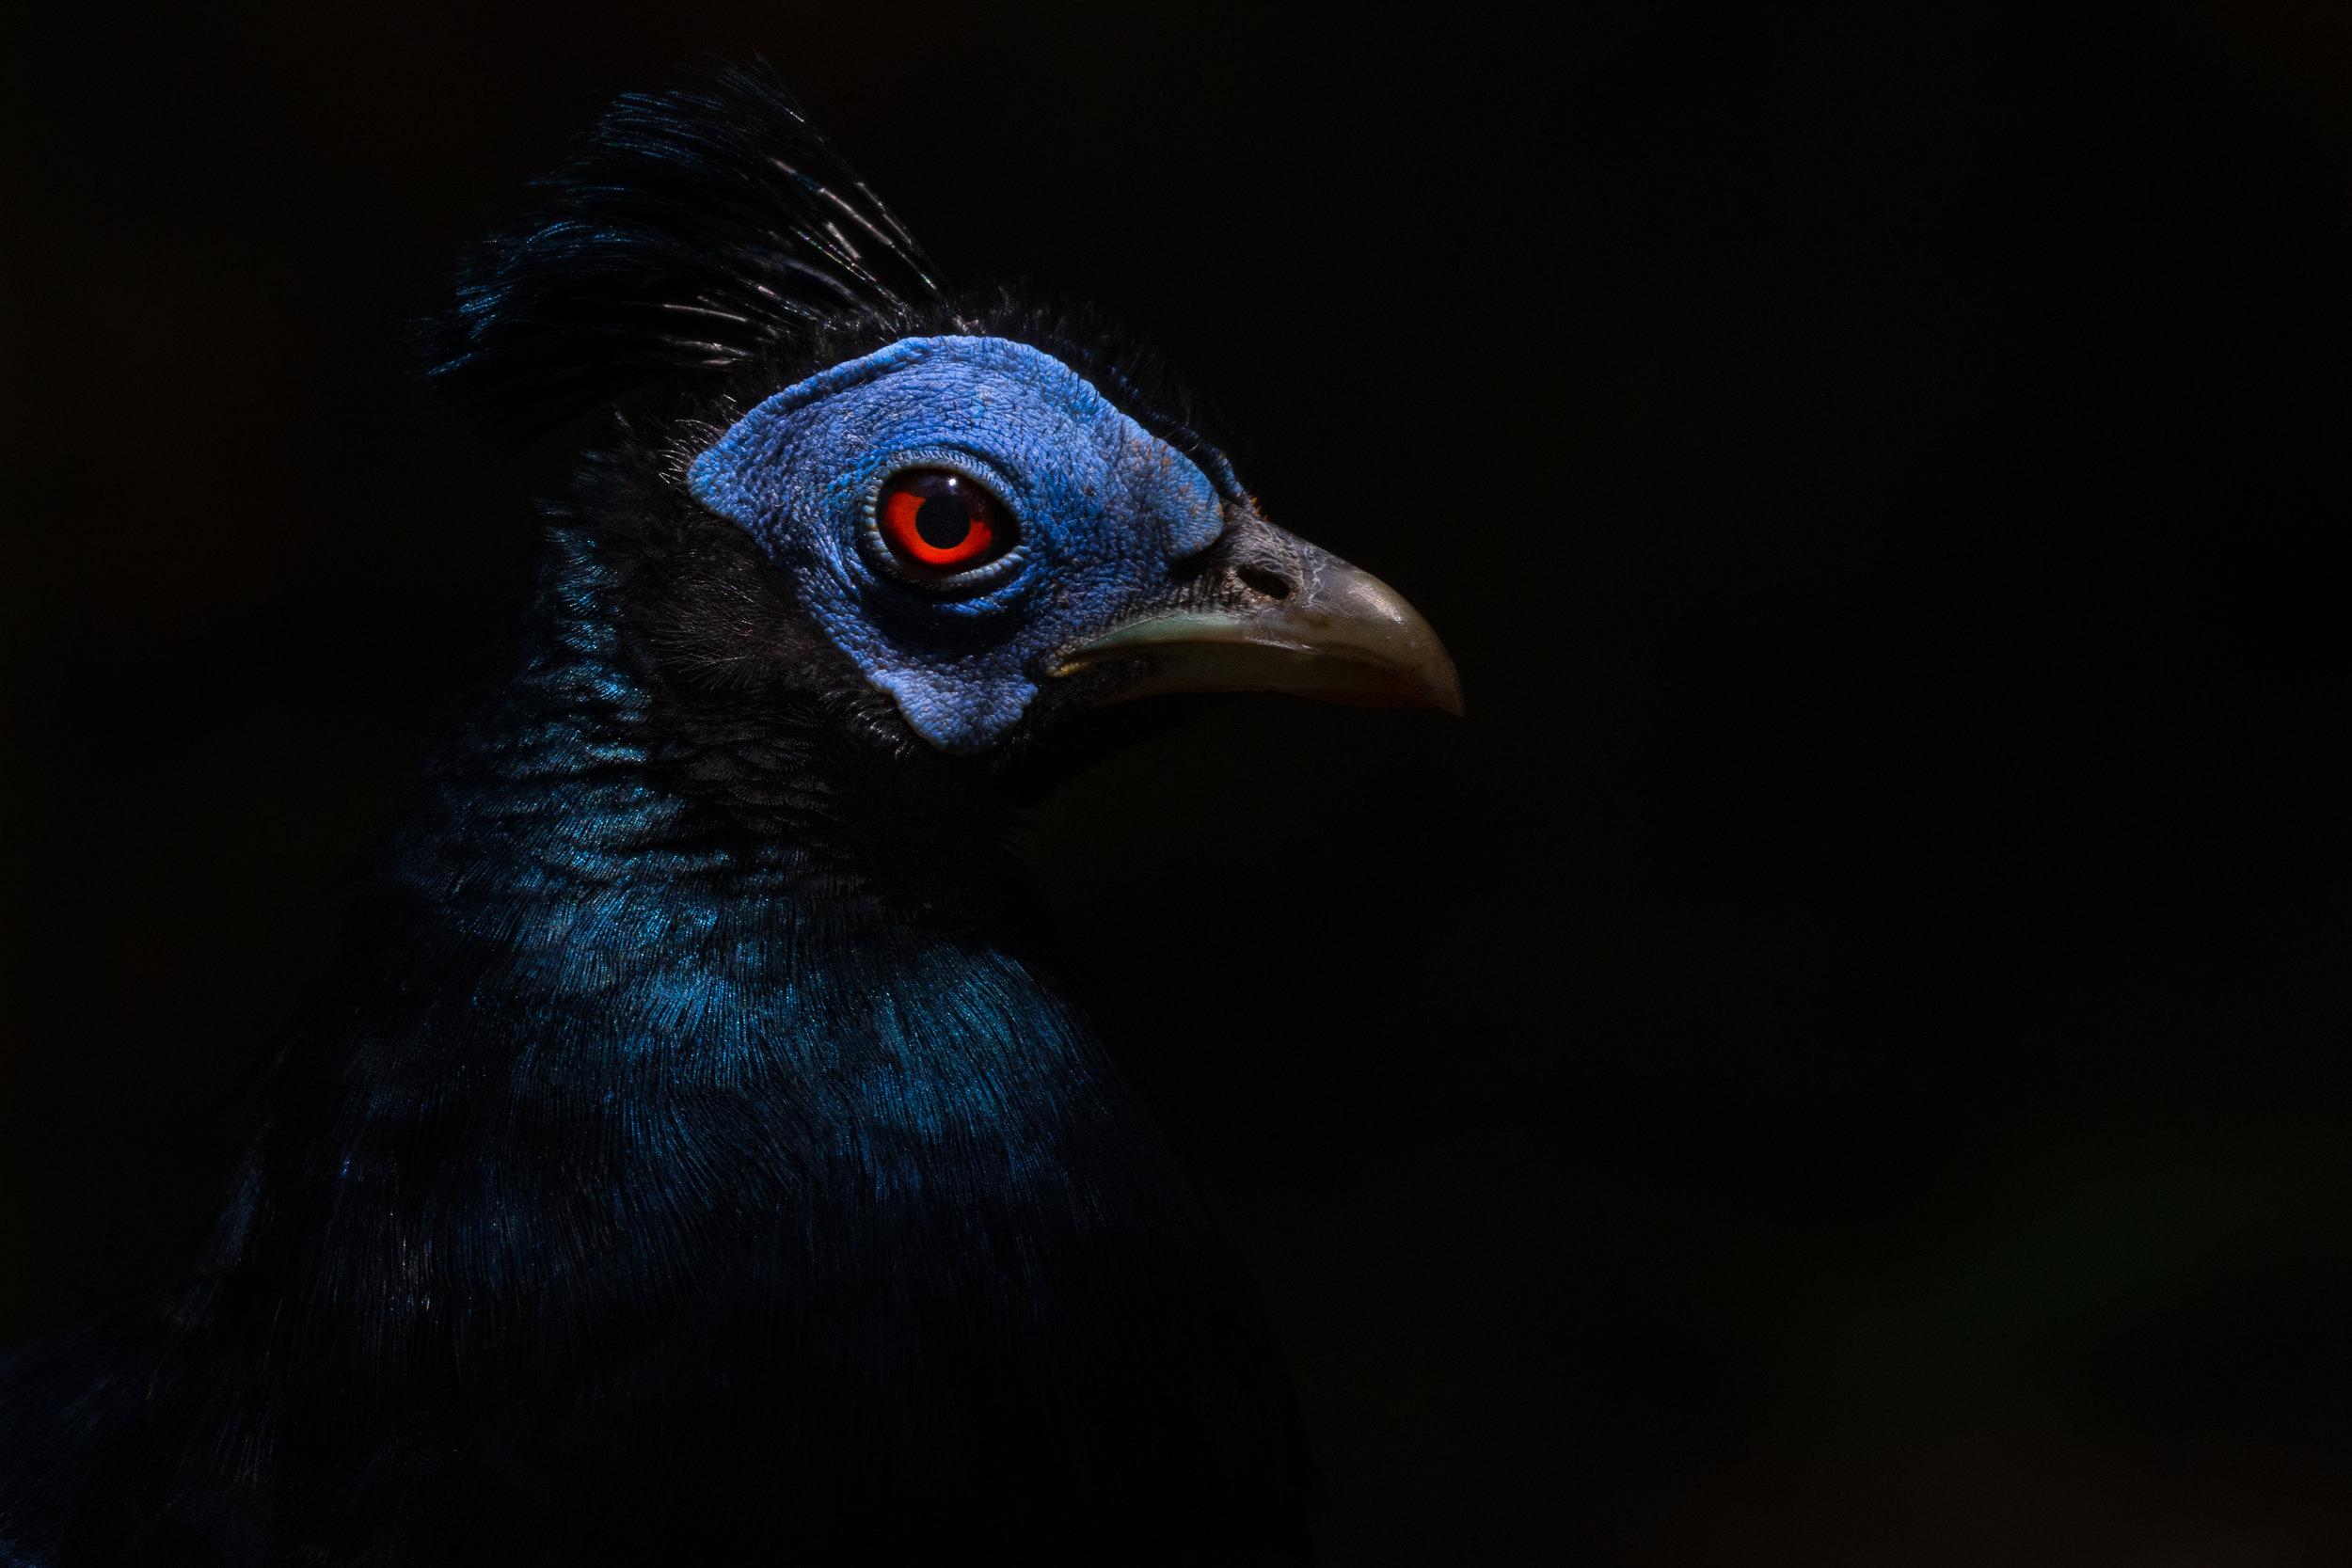 bird_001 (1 of 1).jpg